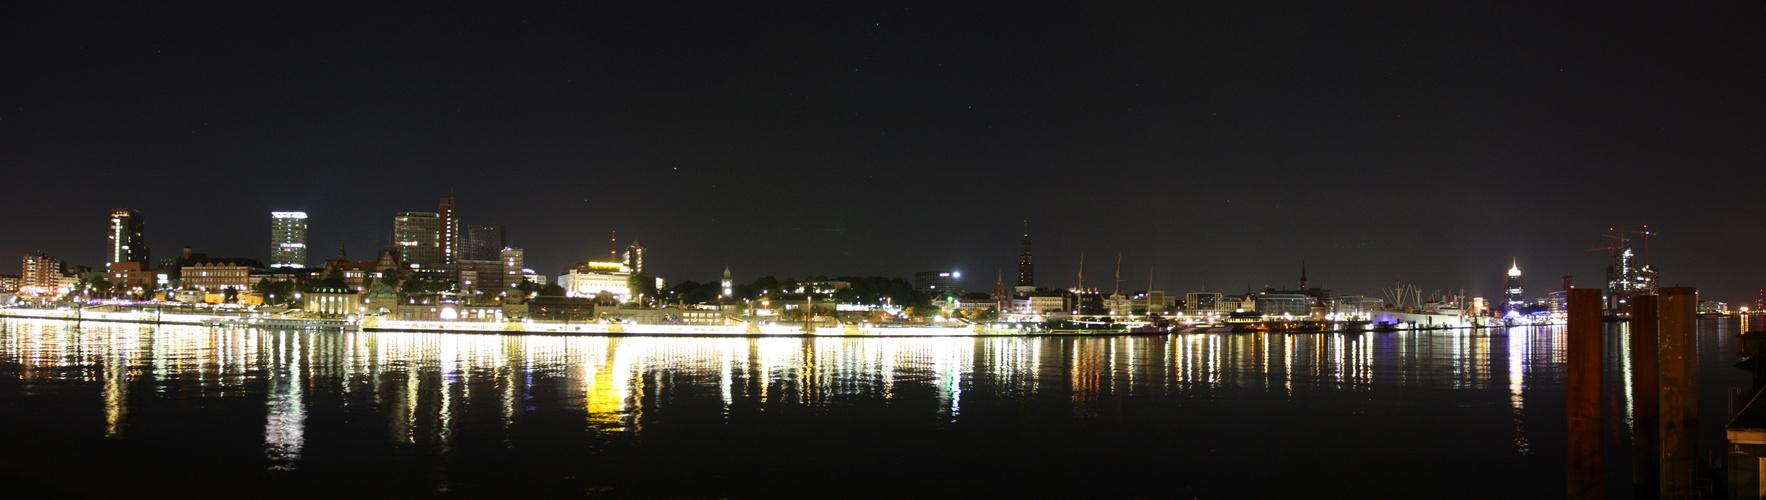 hamburg skyline at night